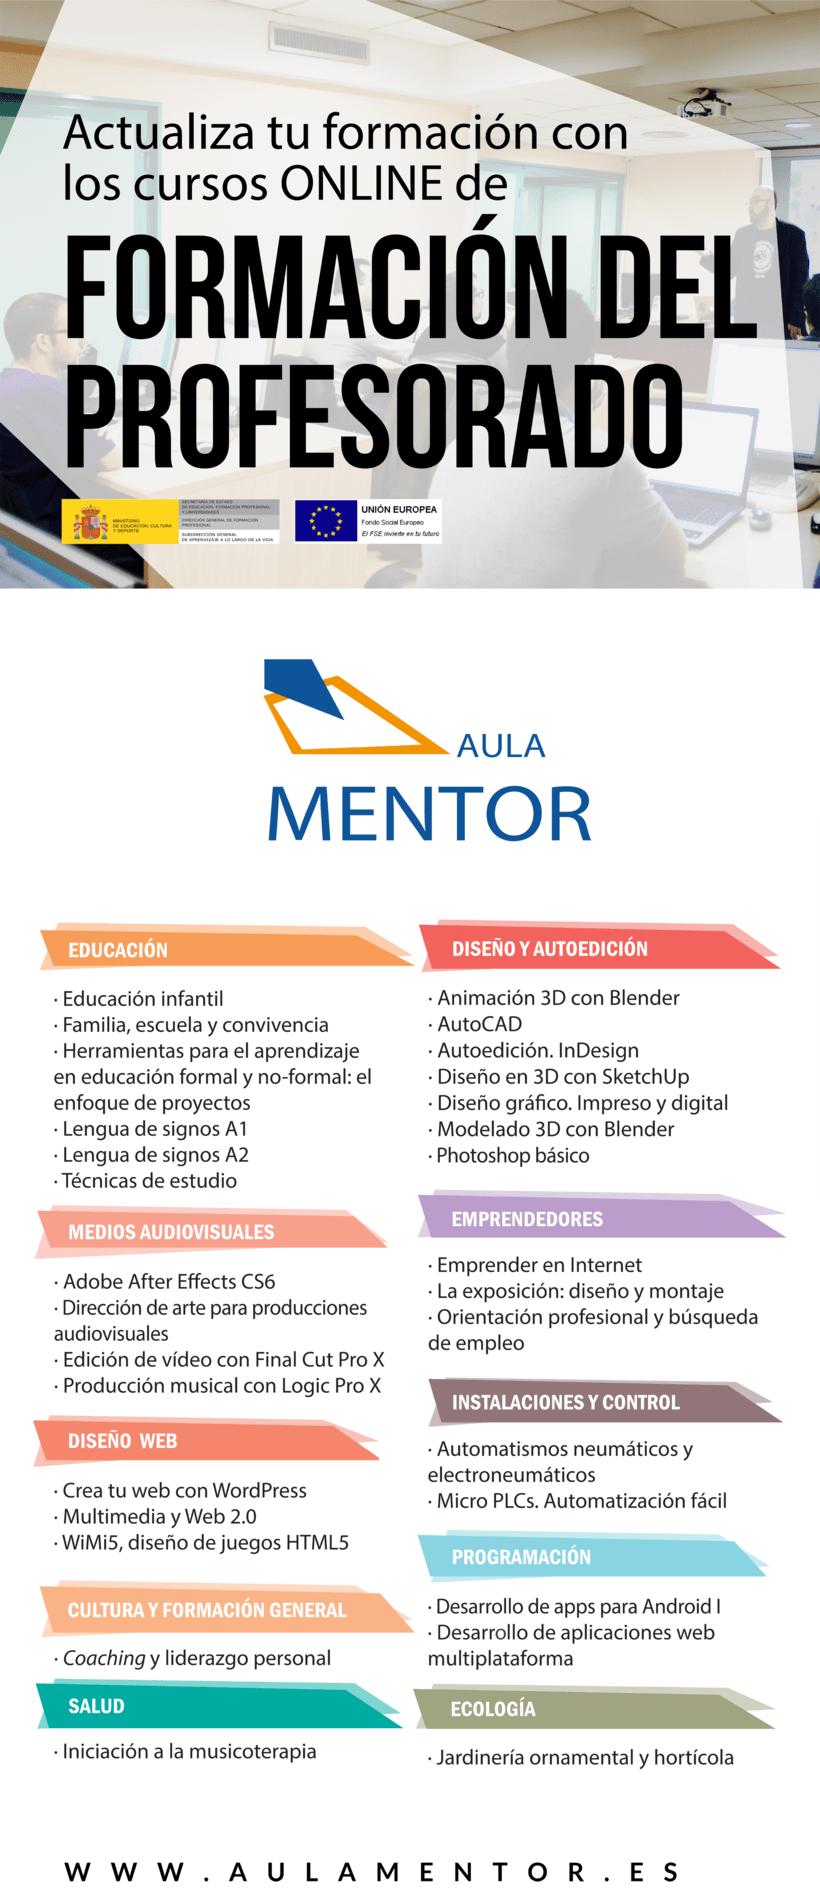 AULA 2017 - Stand Aula Mentor 4